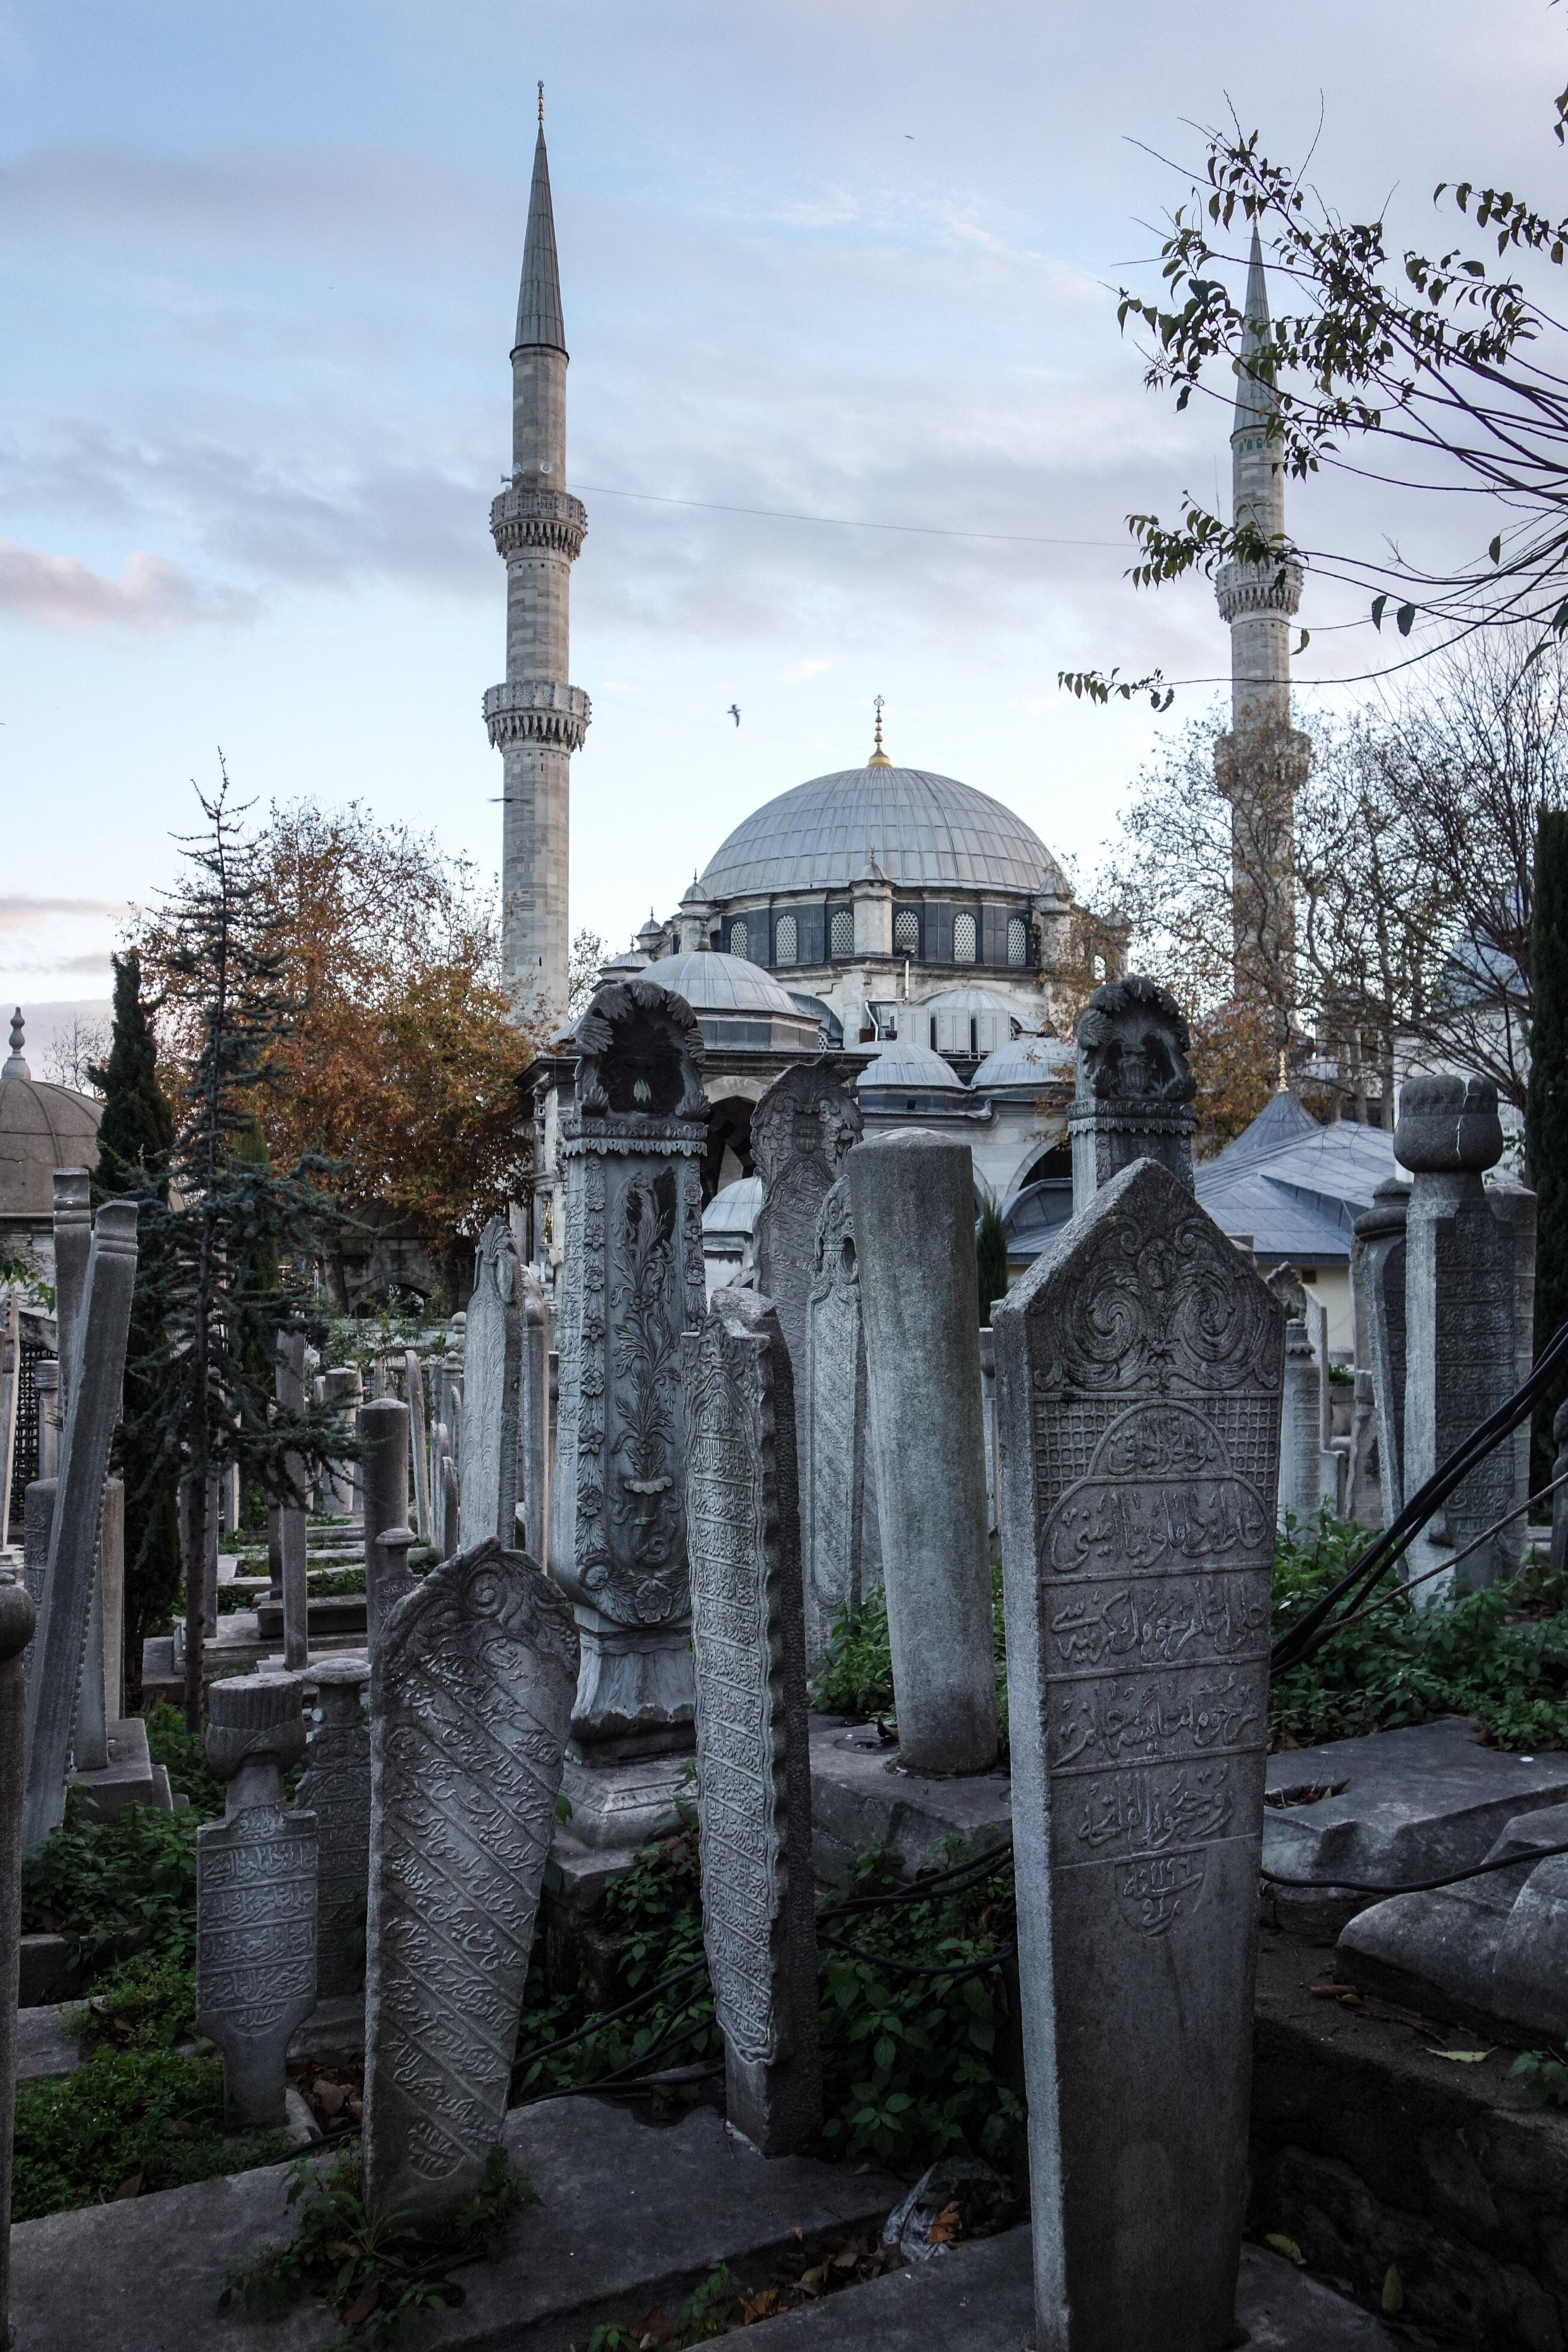 La moschea di Eyup a Istanbul vista dal cimitero Turgay Hantal Mezarlık